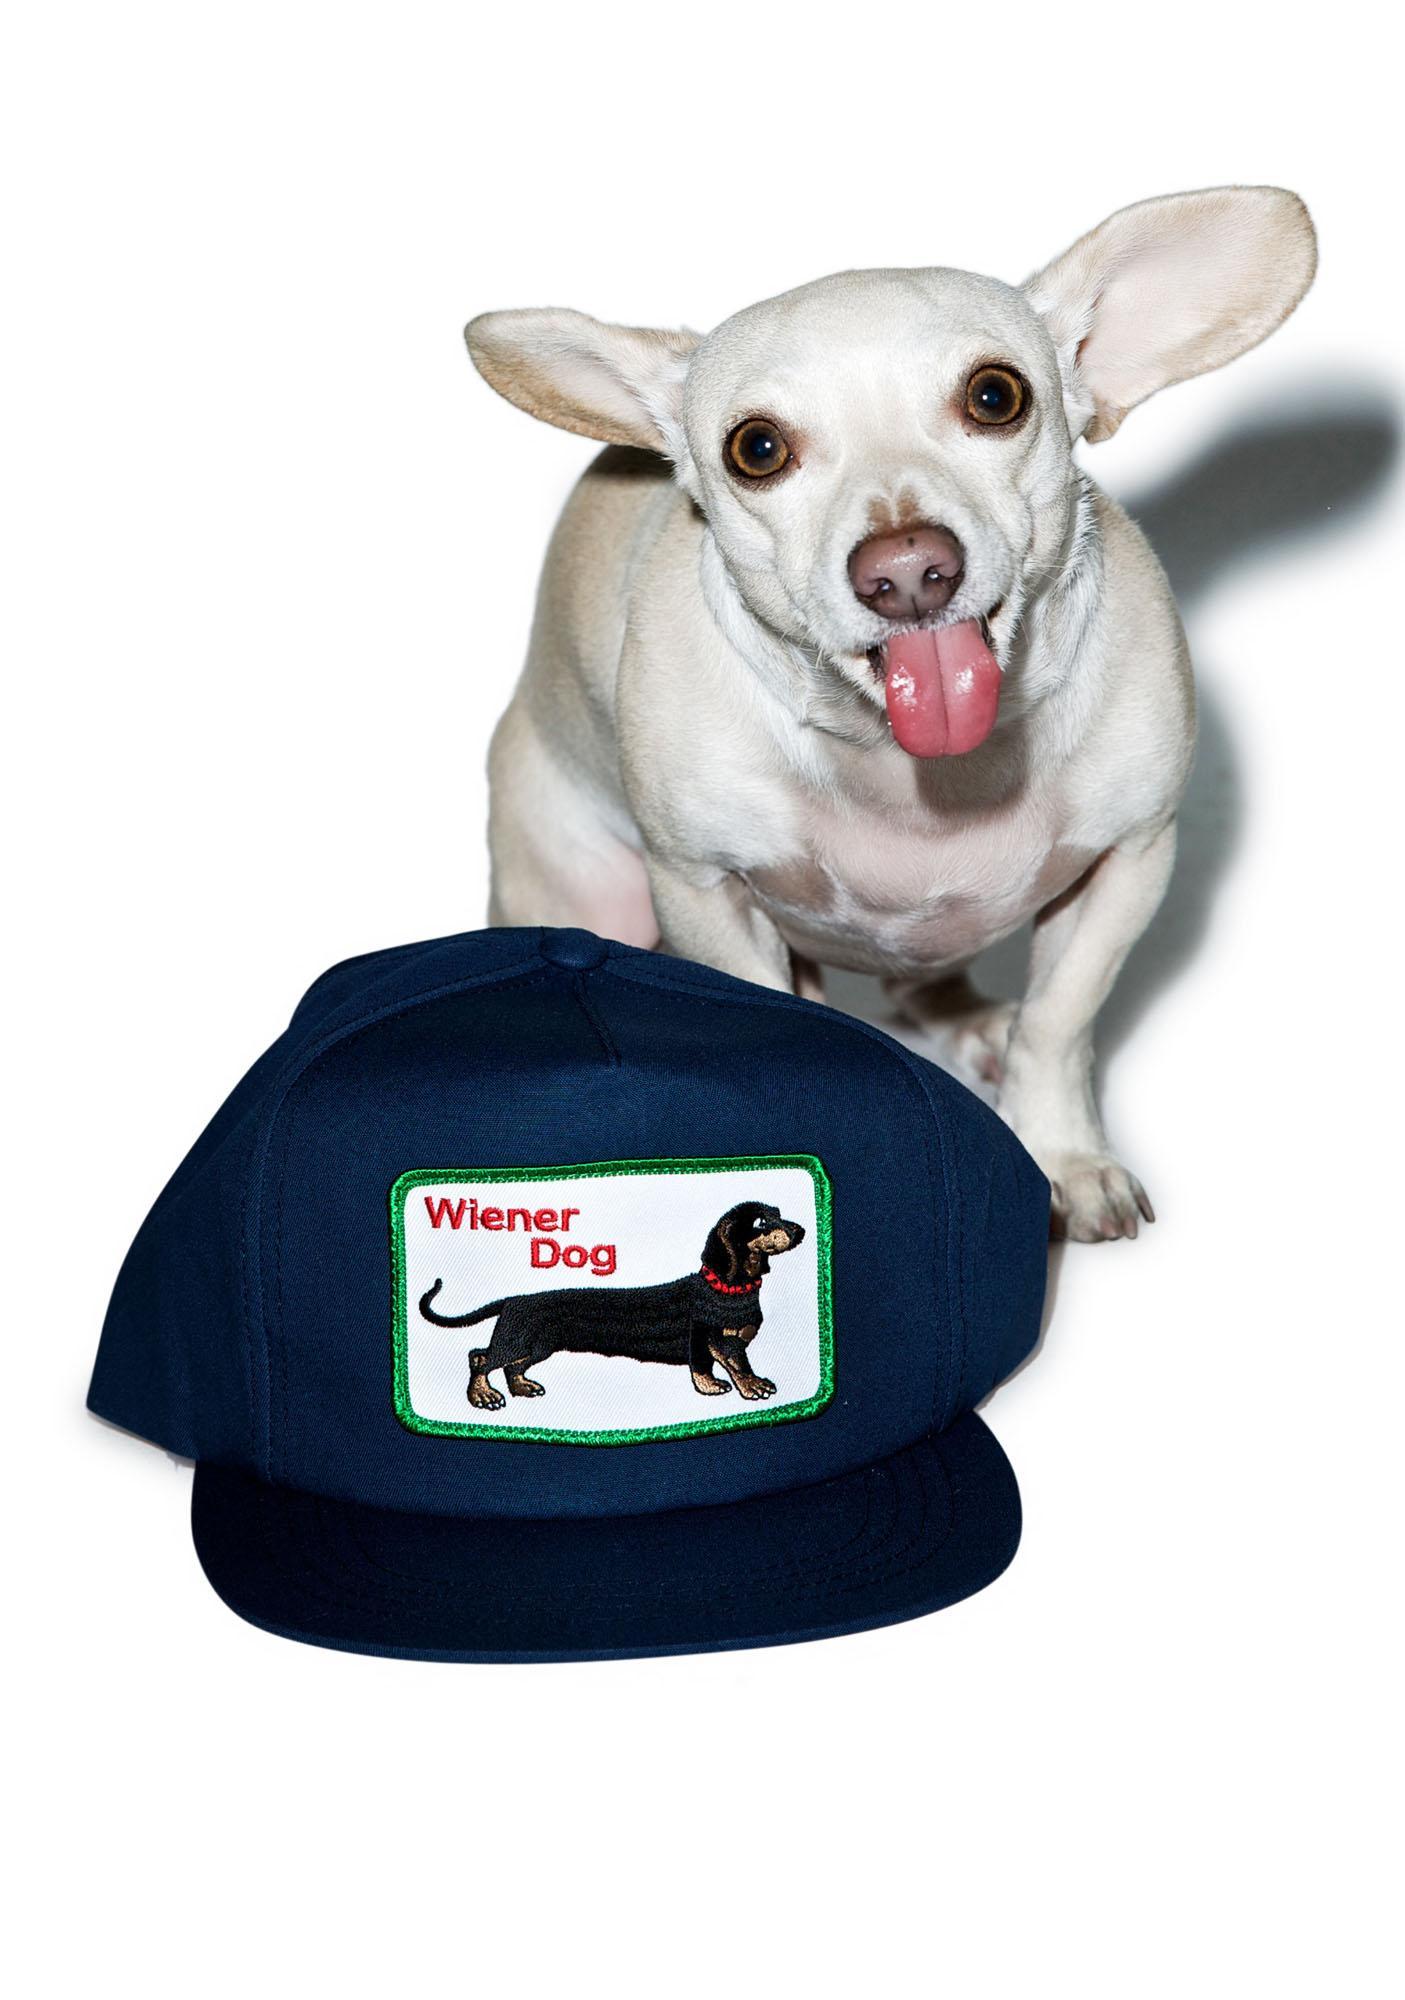 Wiener Dog Snapback